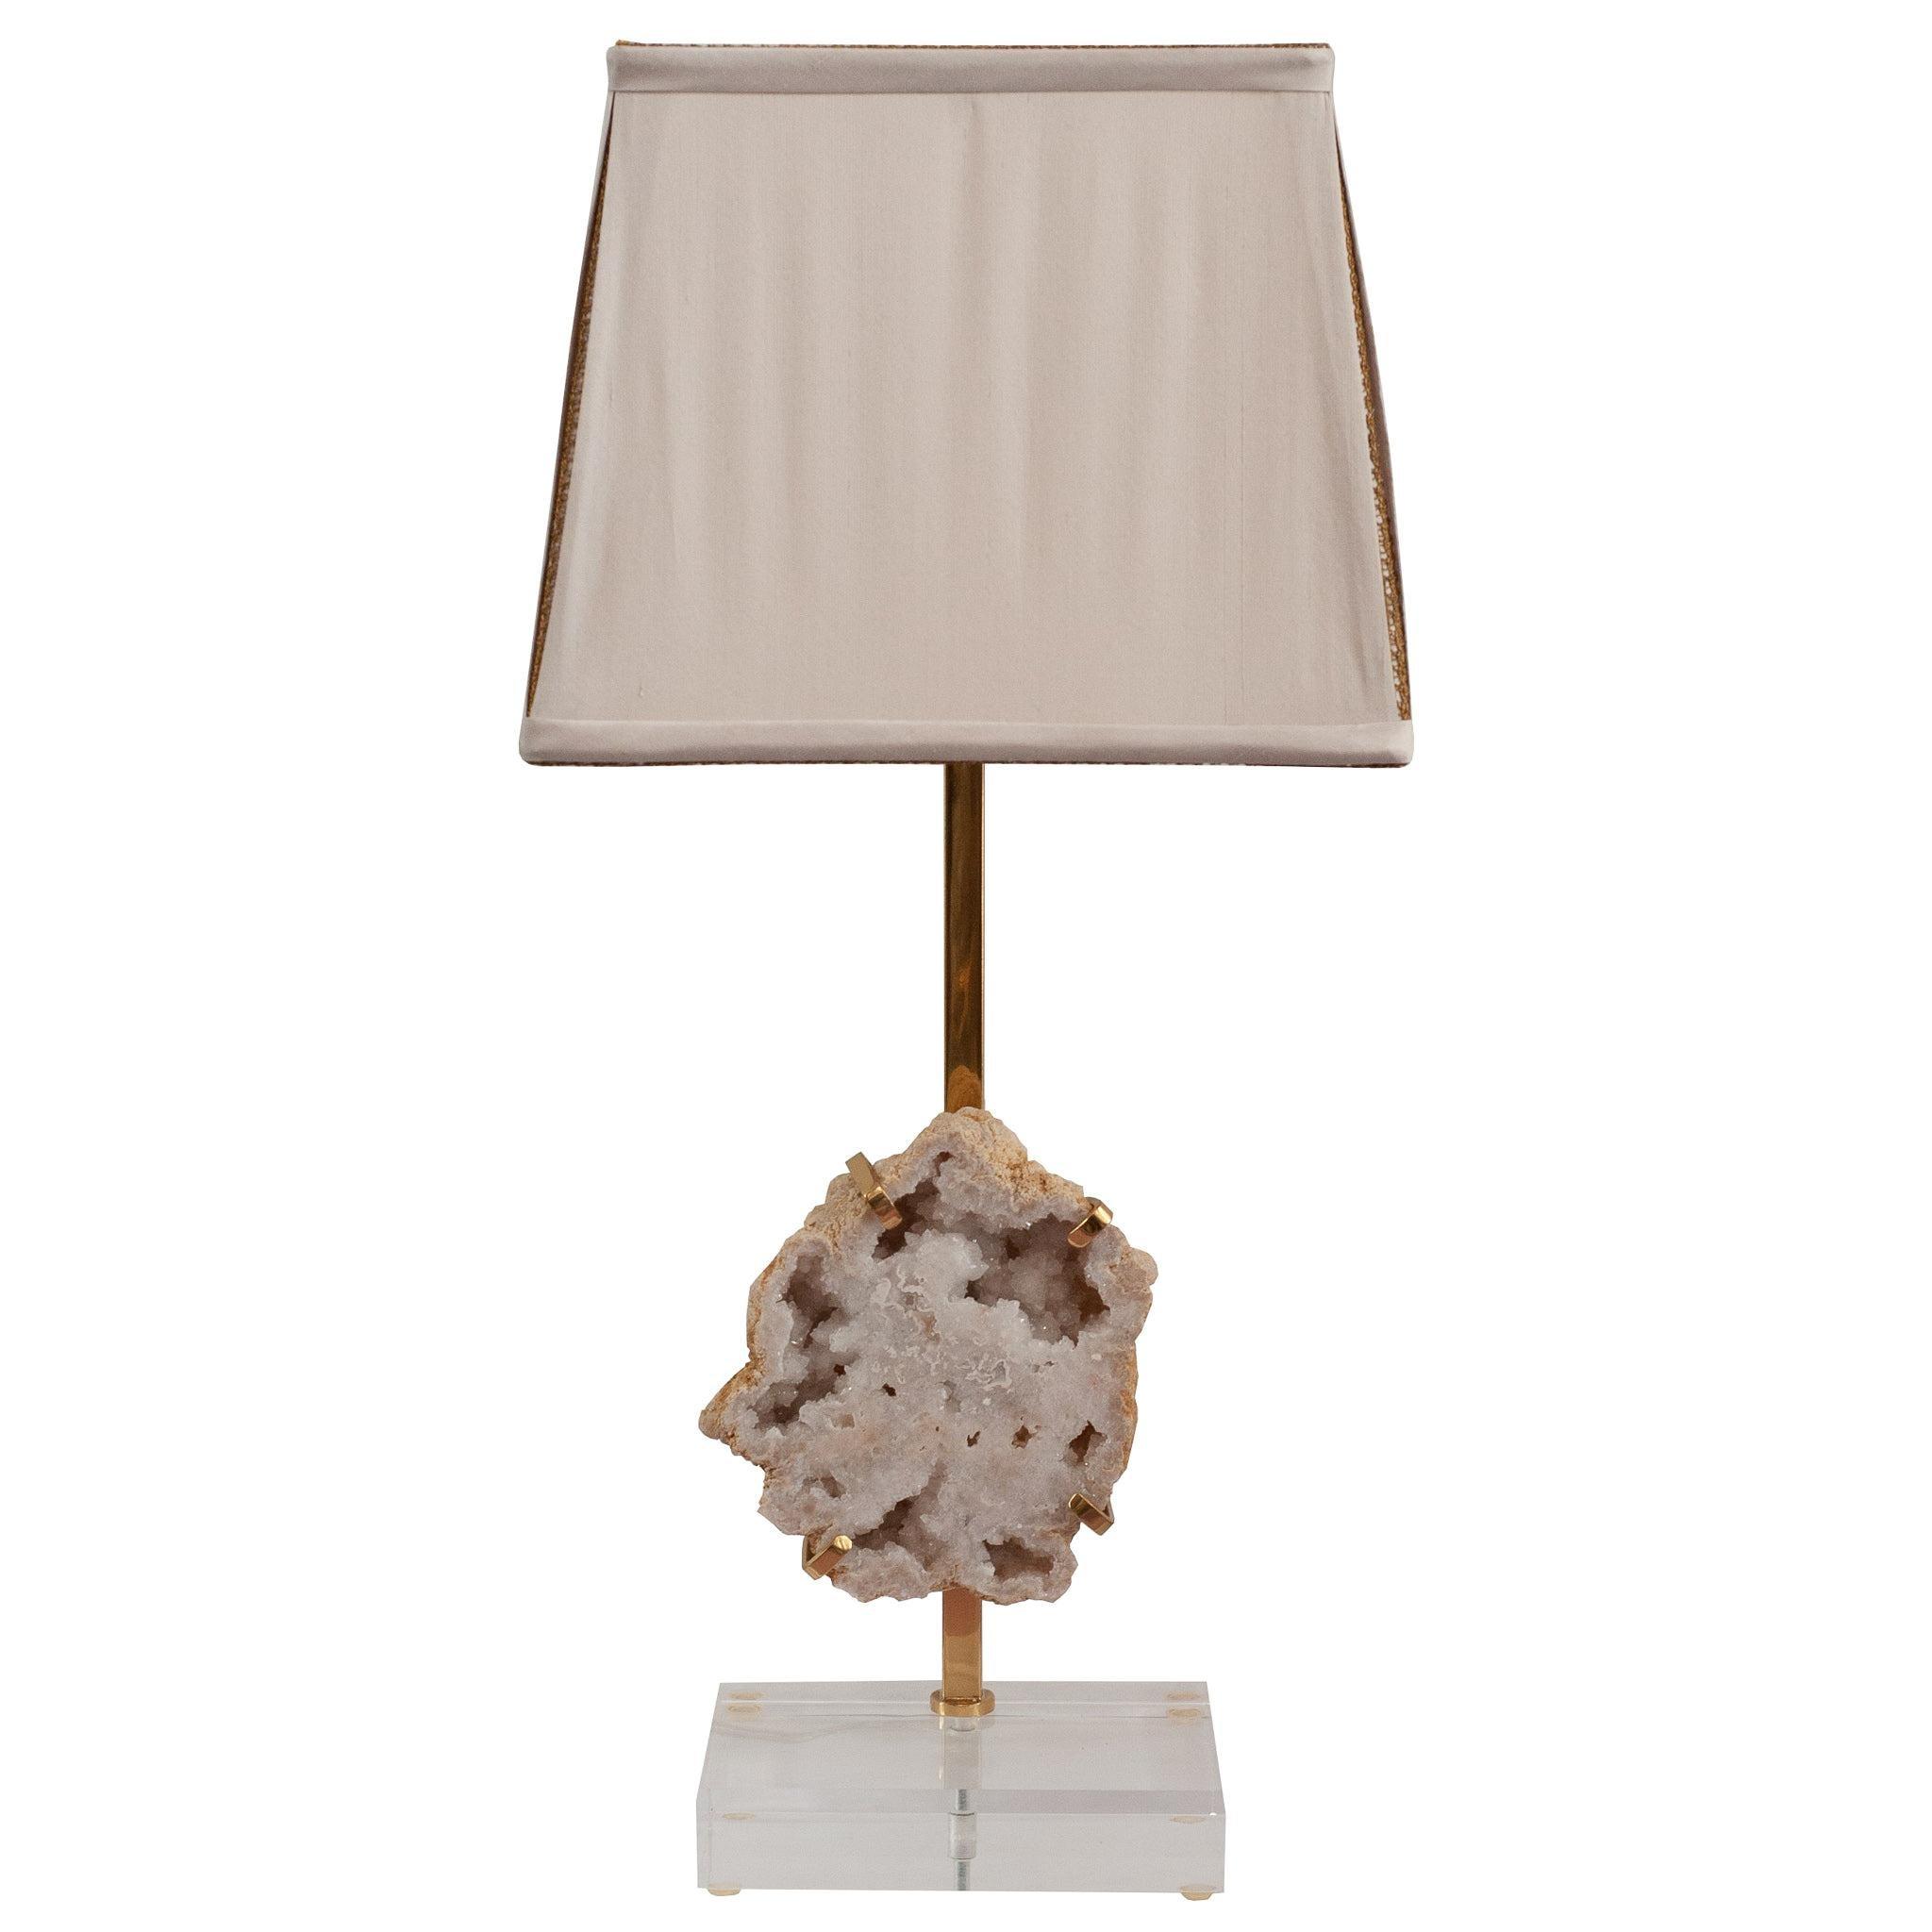 Contemporary White Quartz Geode & Brass Table Lamp with Custom Silk Shade